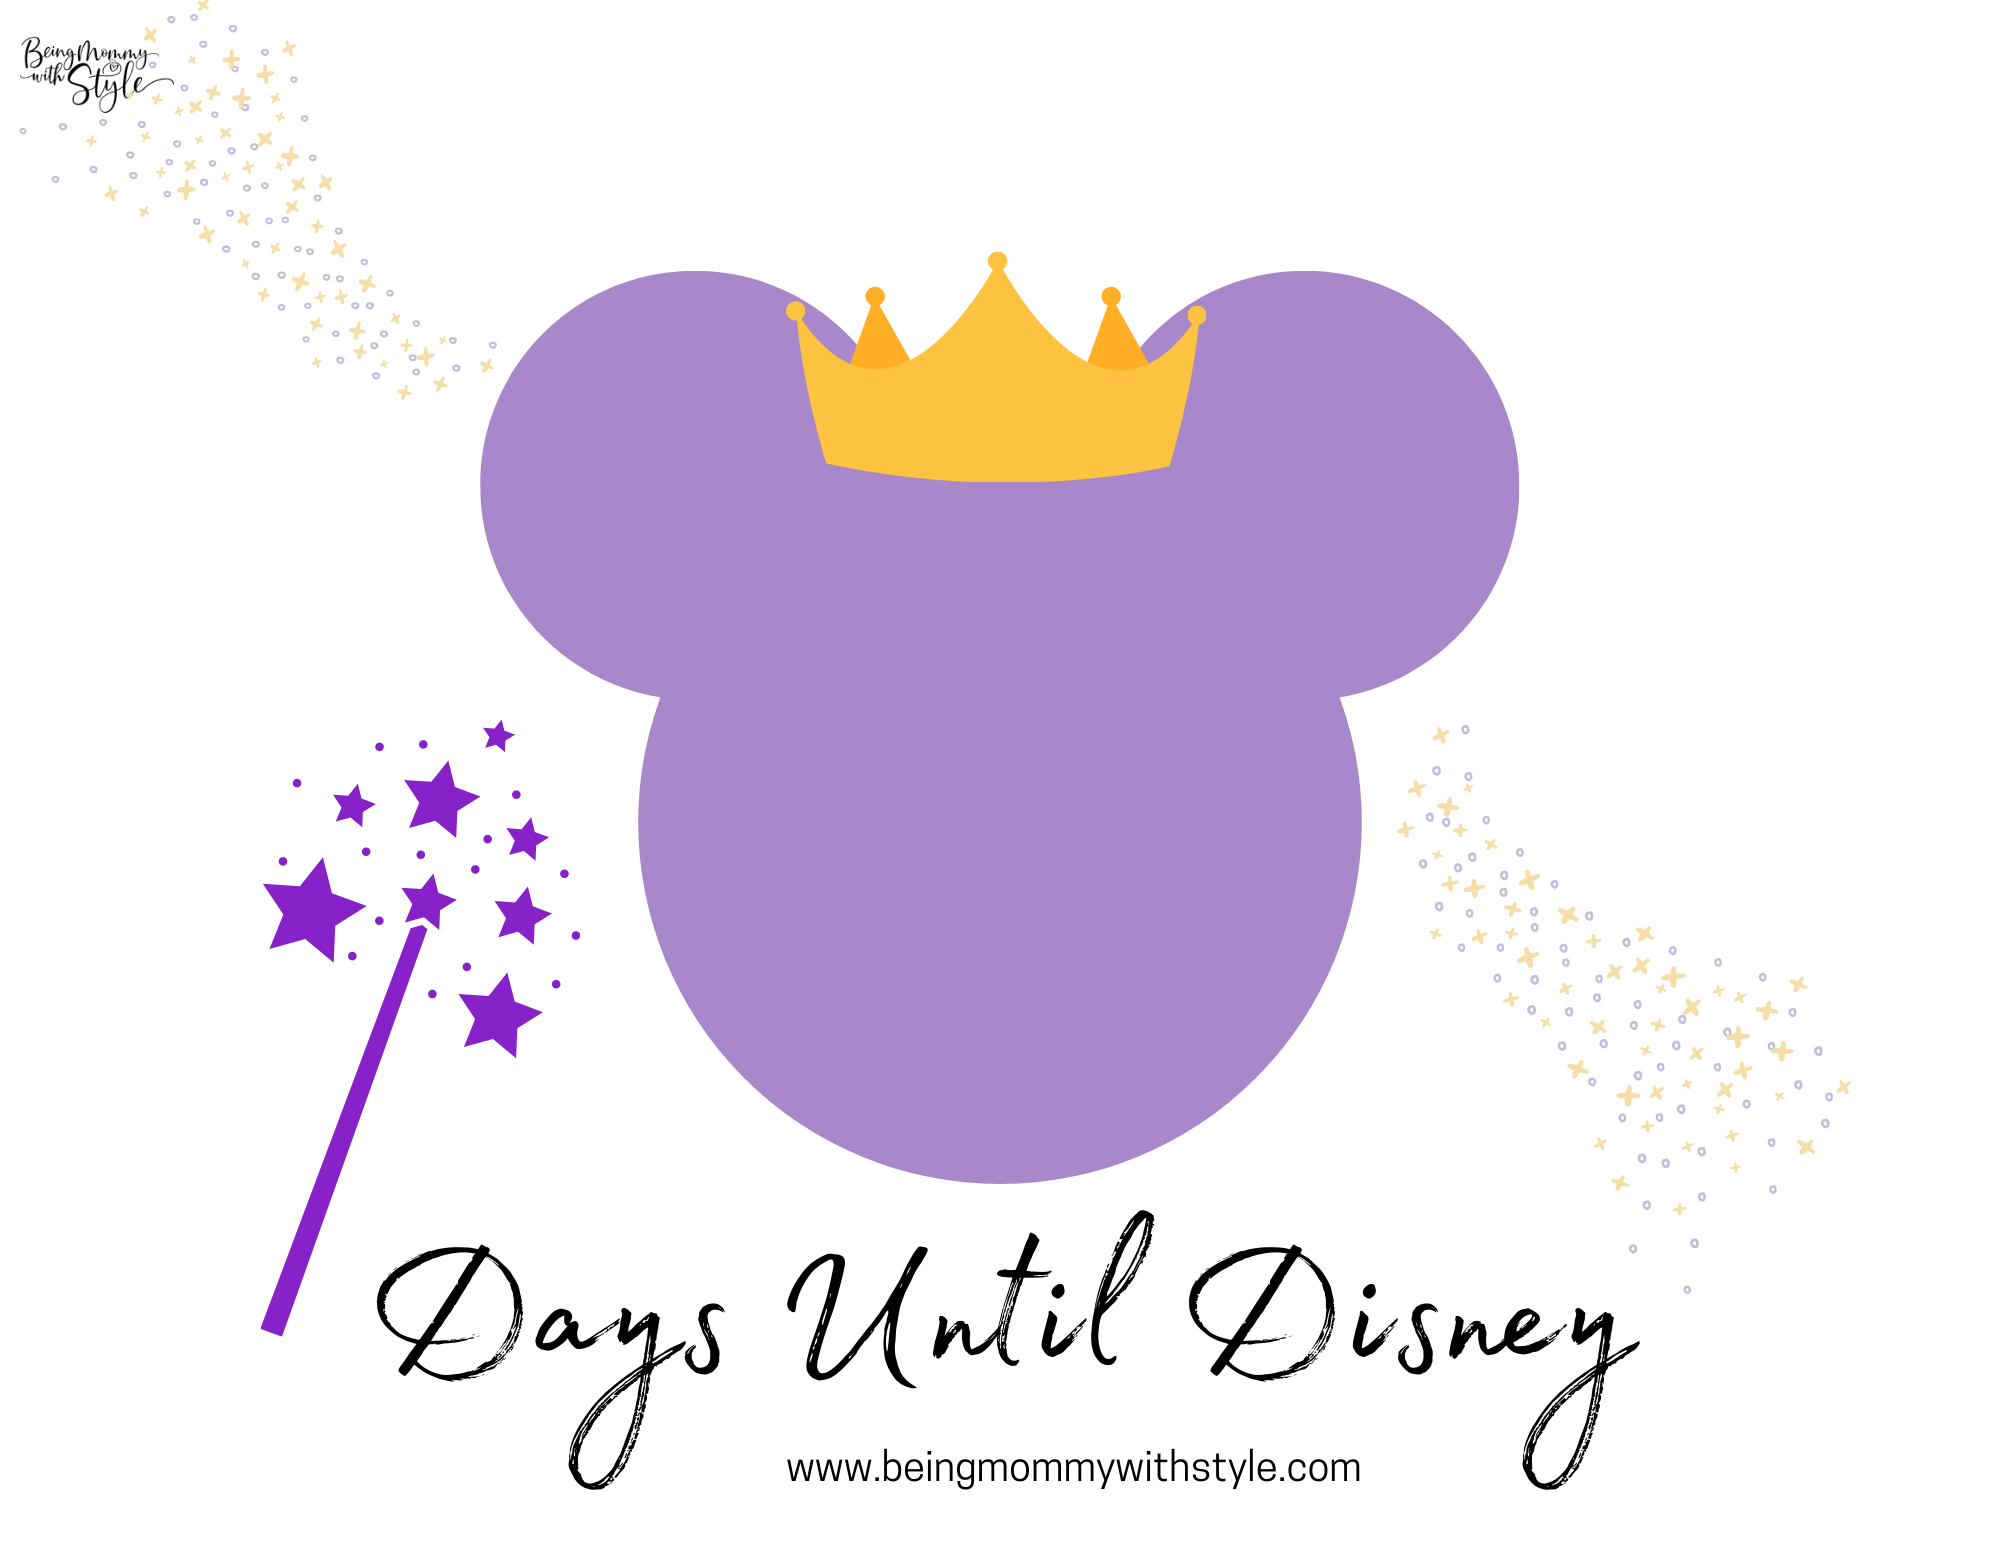 Princess Days Until Disney